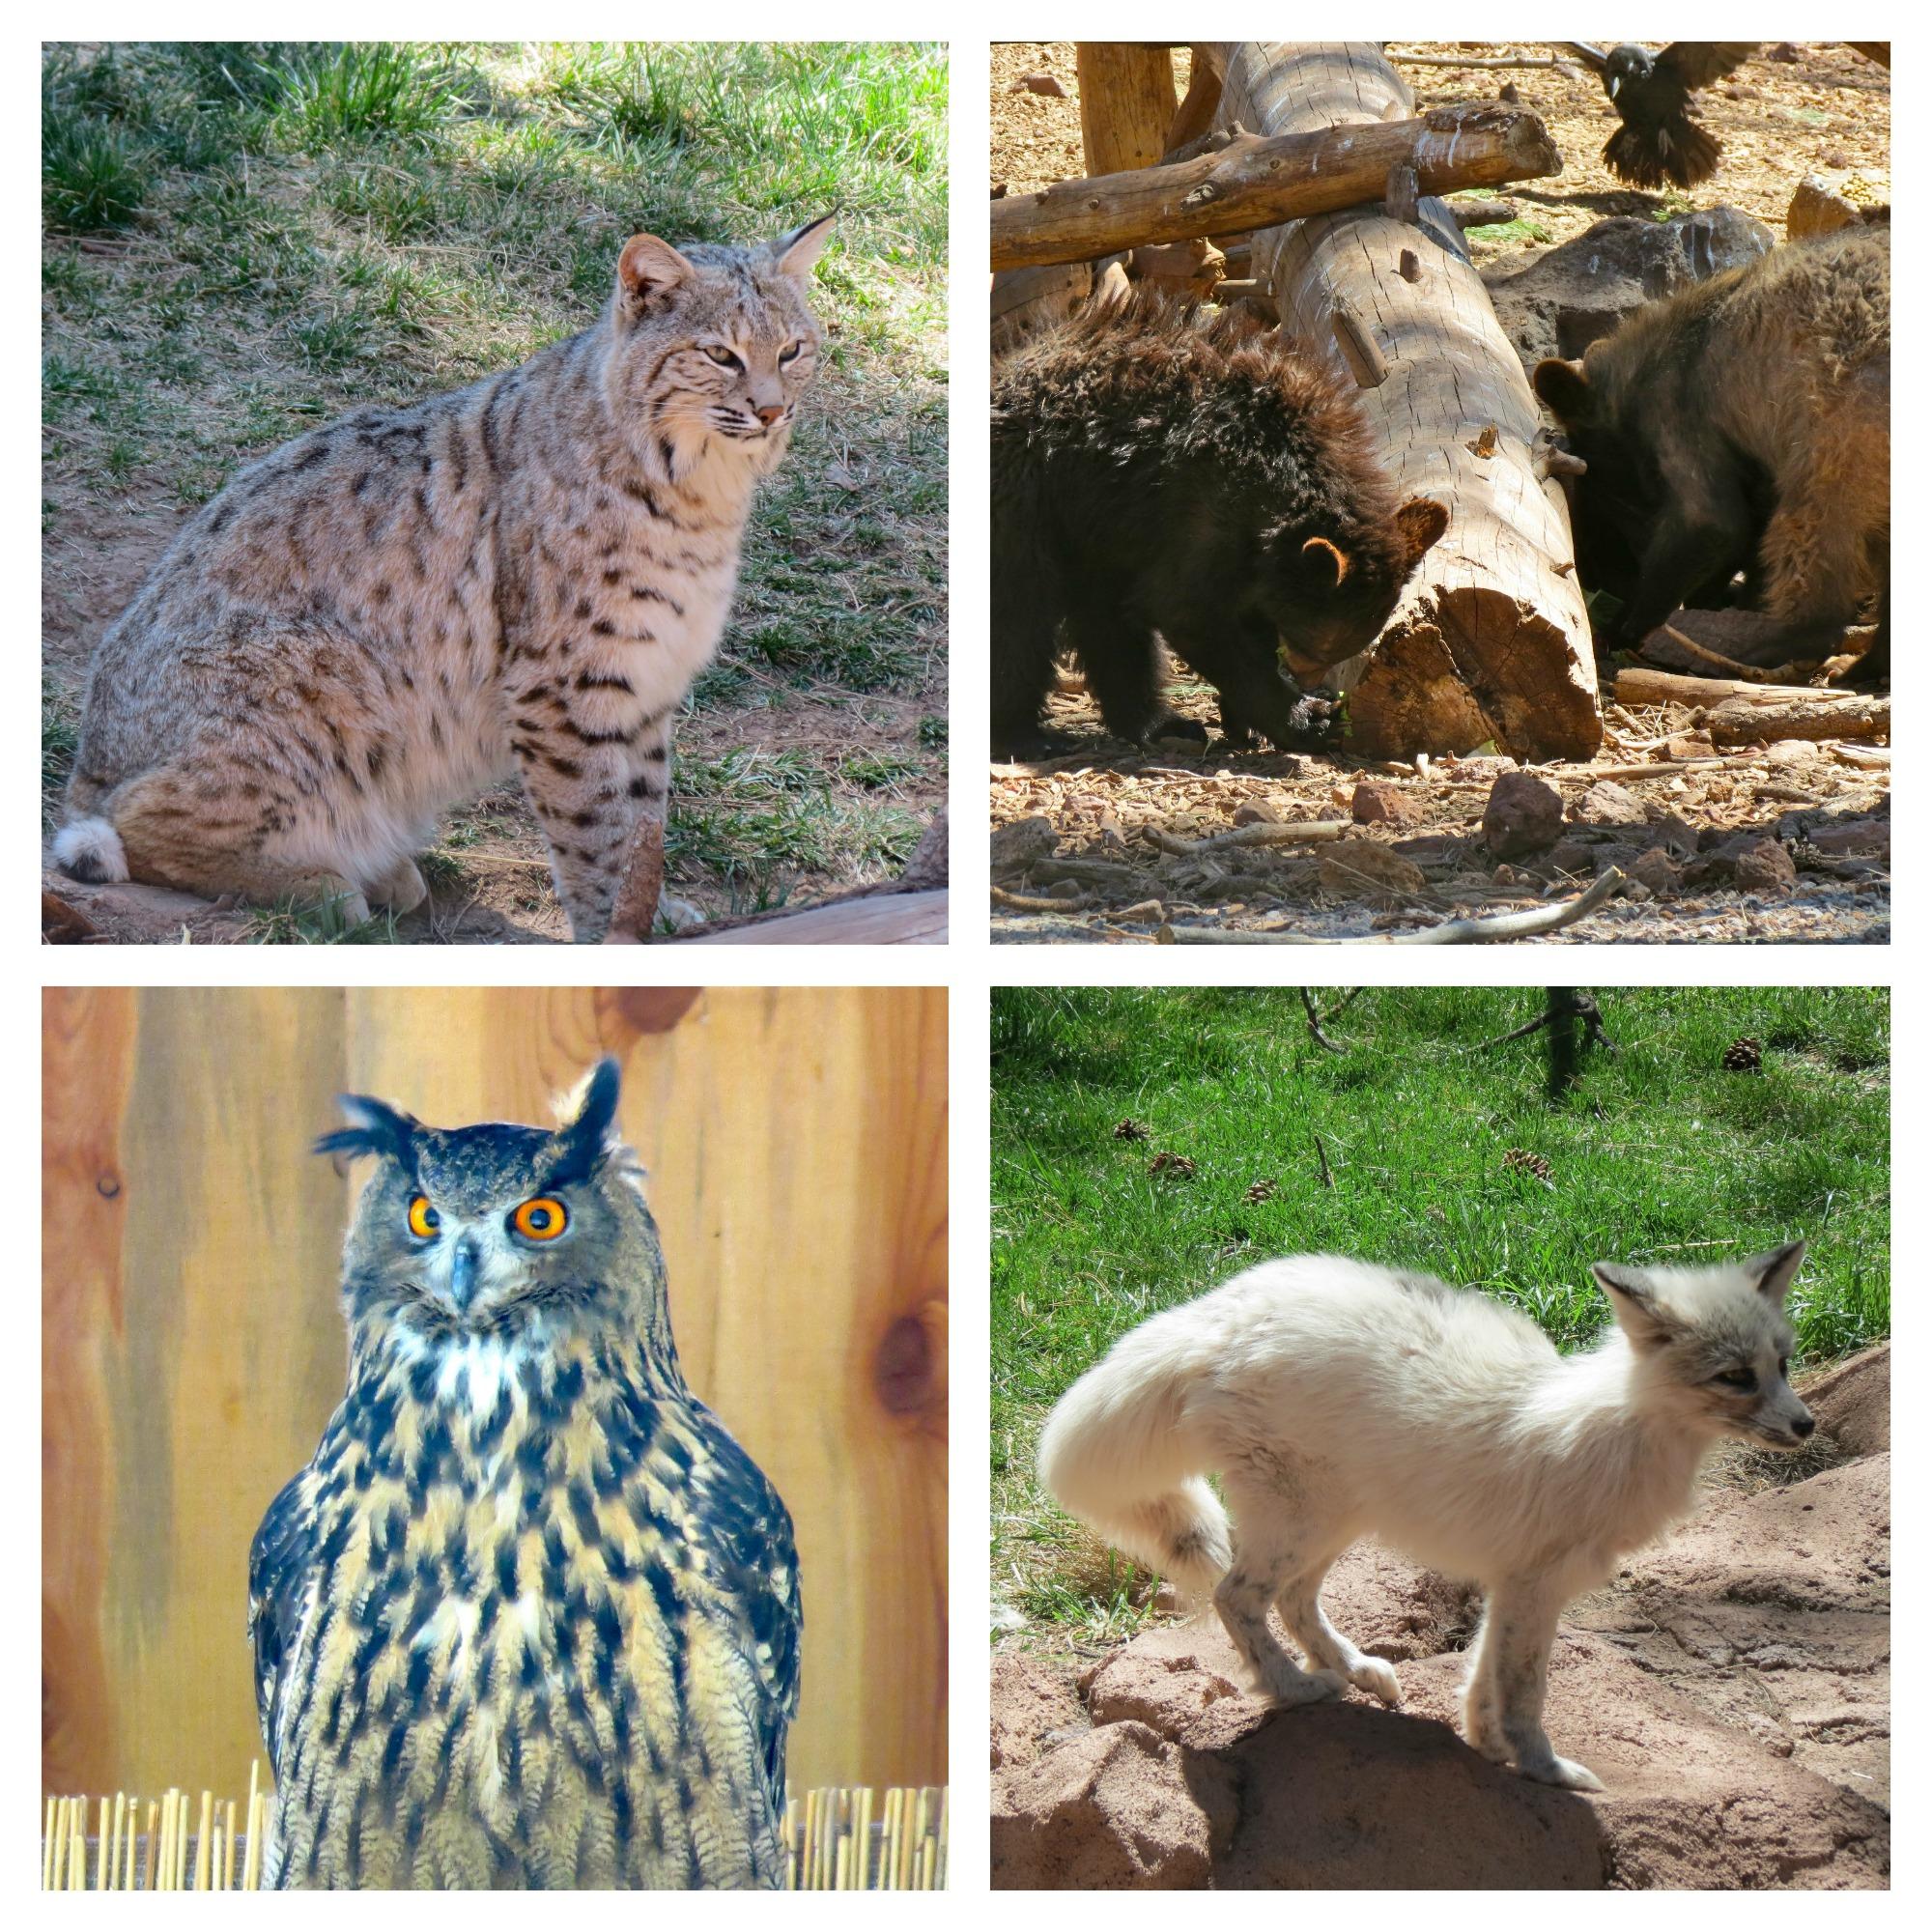 Bearizona Wildlife Park in Arizona